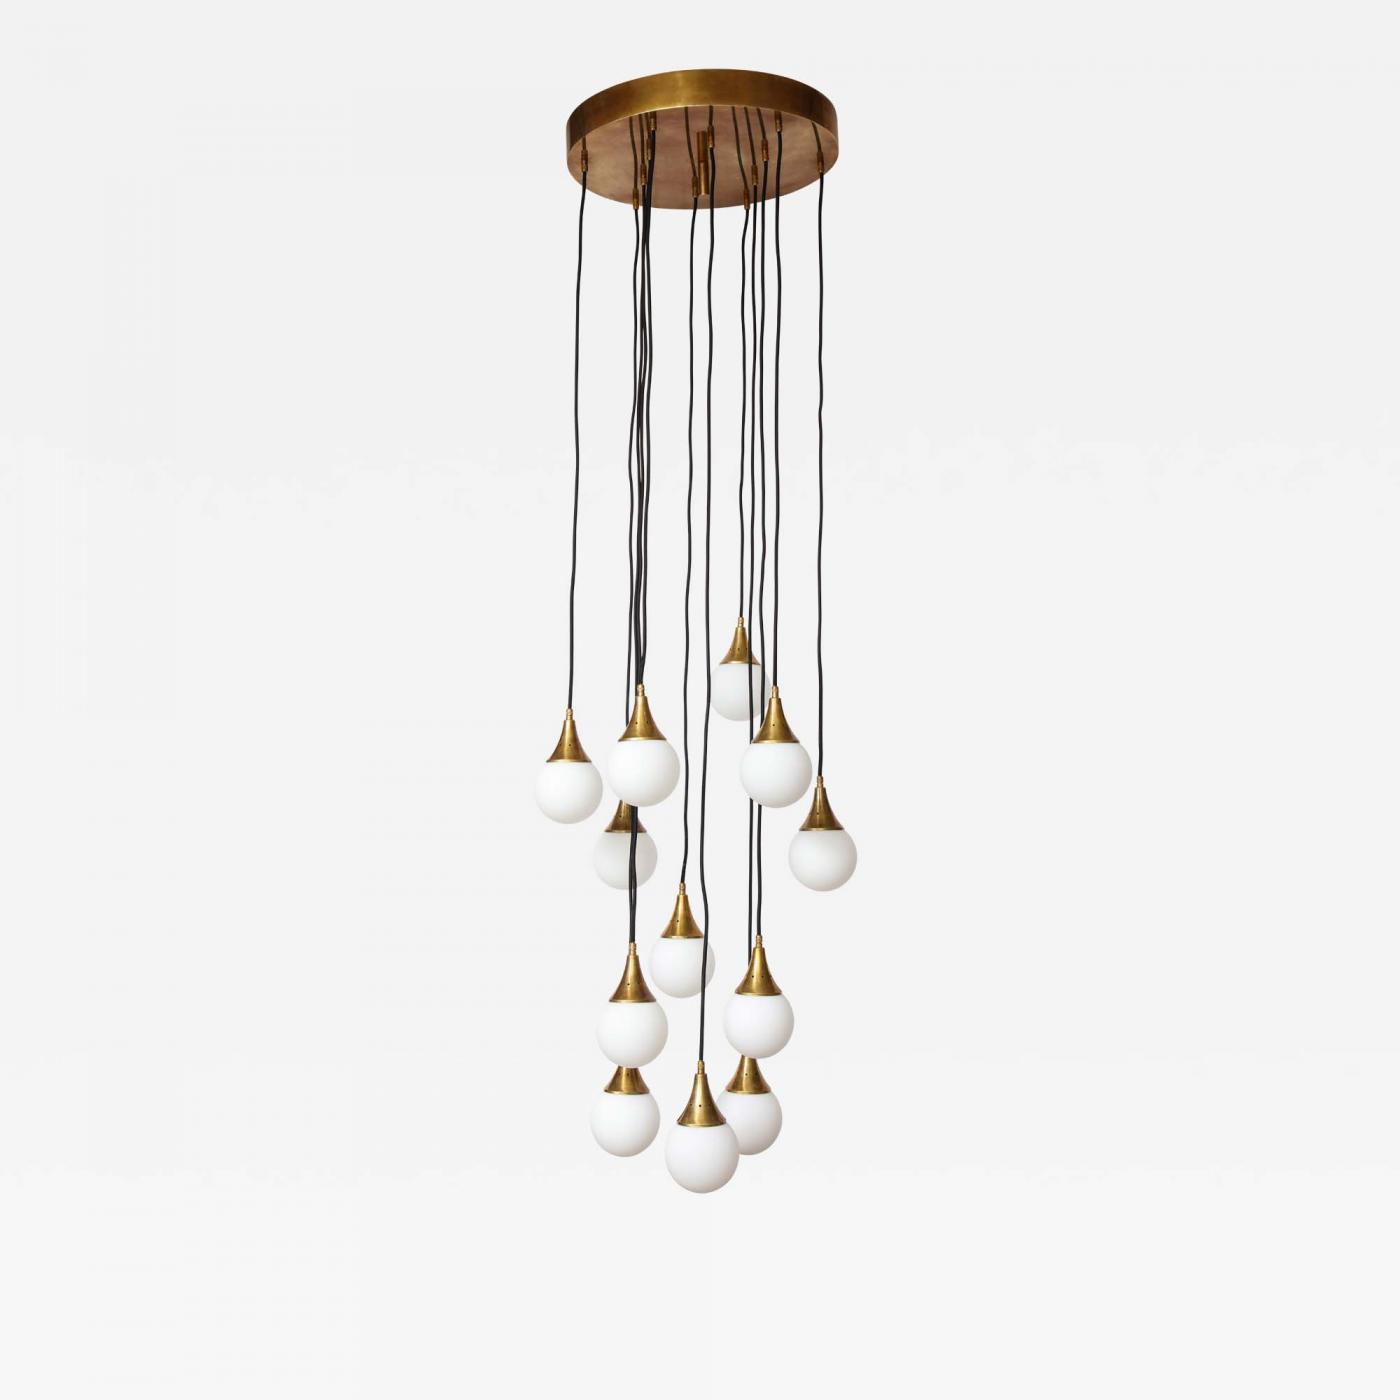 Stilnovo Stilnovo Cascading Chandelier With Twelve Opaline Glass Ball Lights